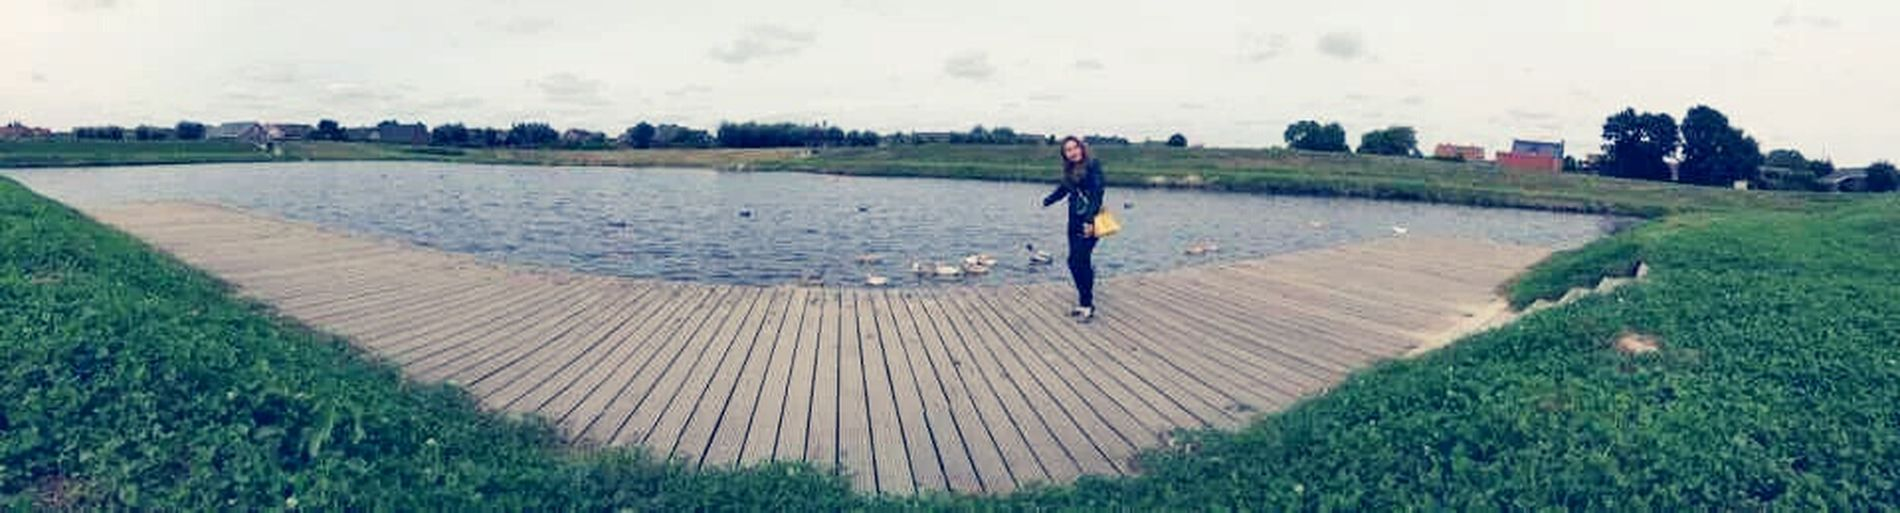 hello ducks Pittem Belgium